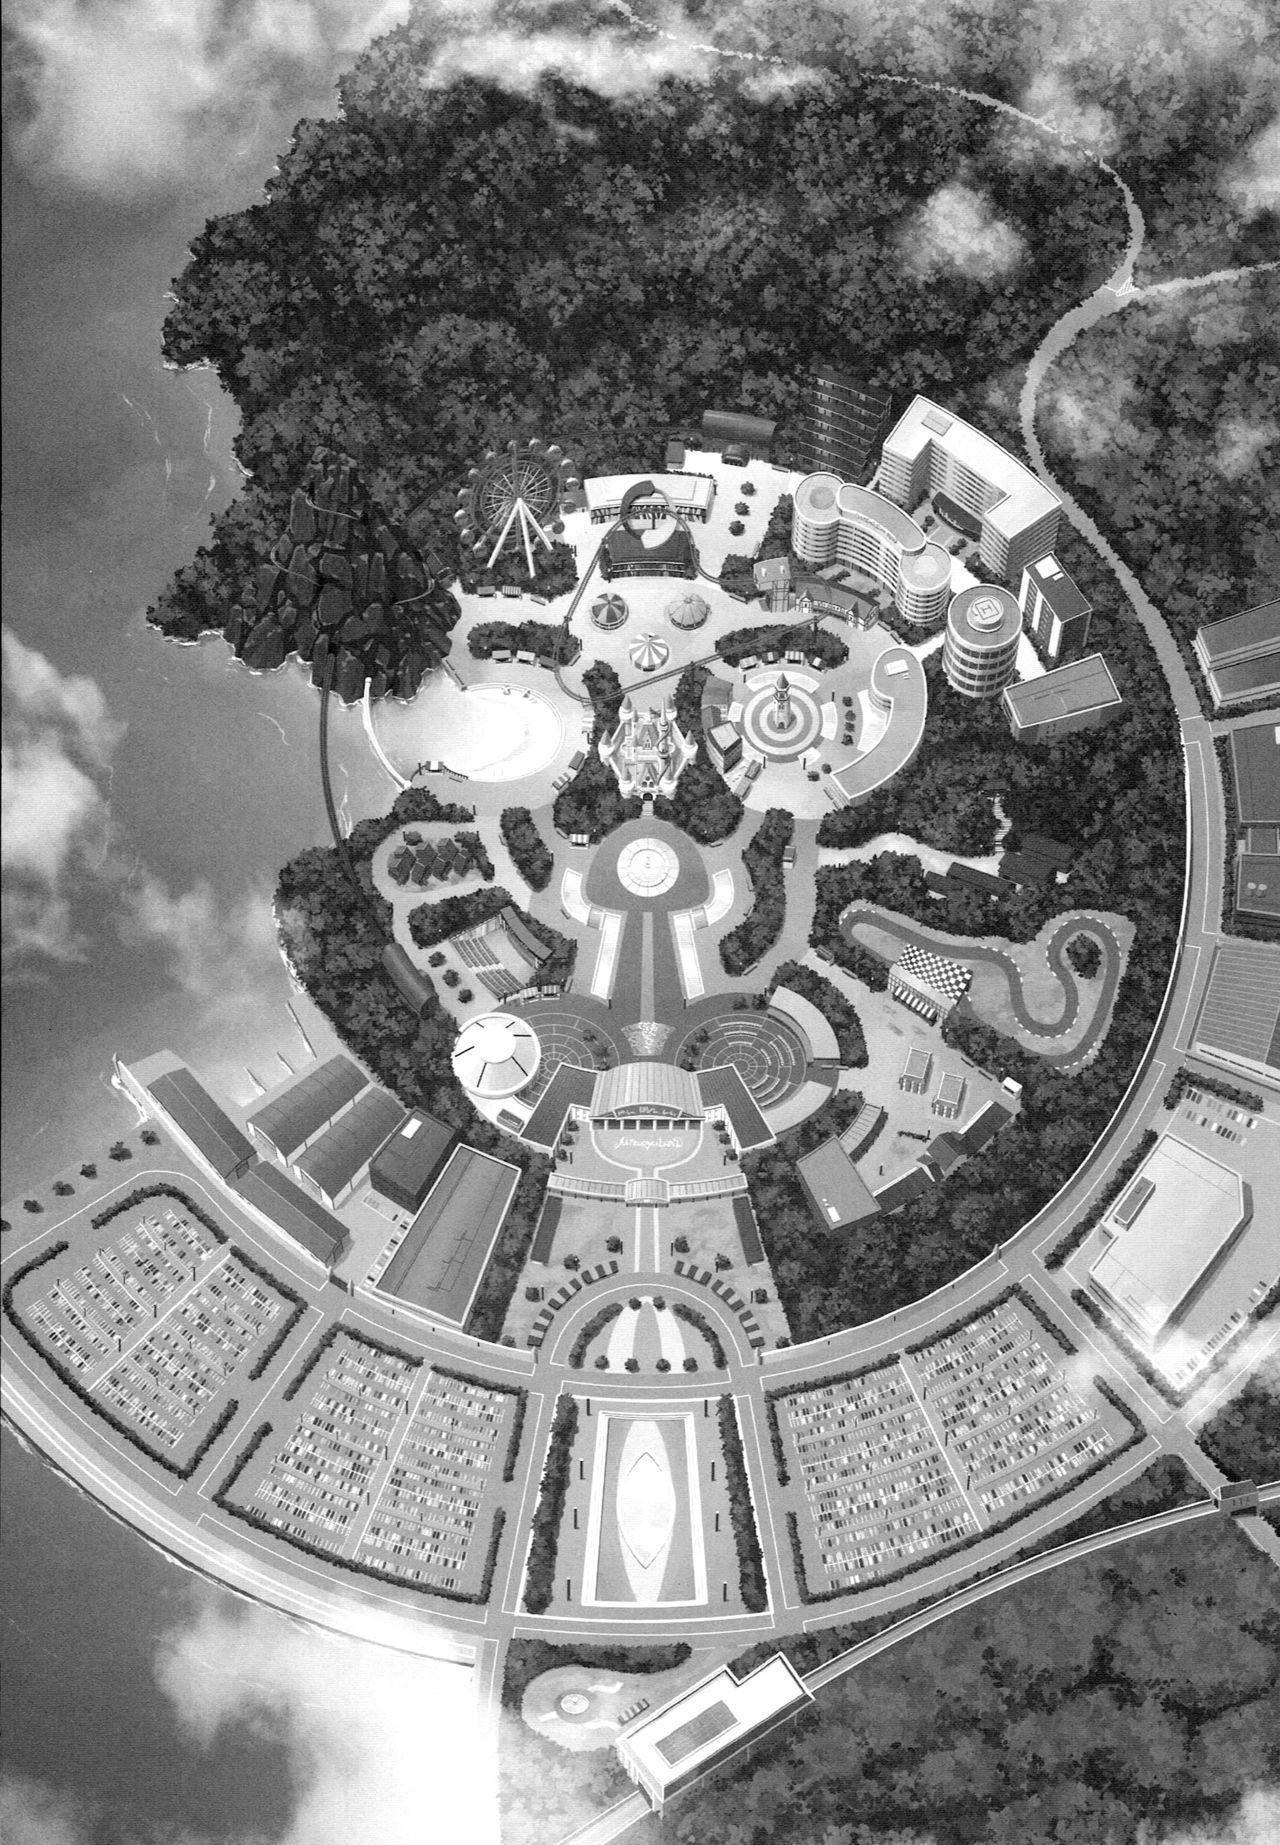 Oideyo! Mizuryu Kei Land the 6.5 Bangaihen - Kazoku to Sukebe na Theme Park! 3